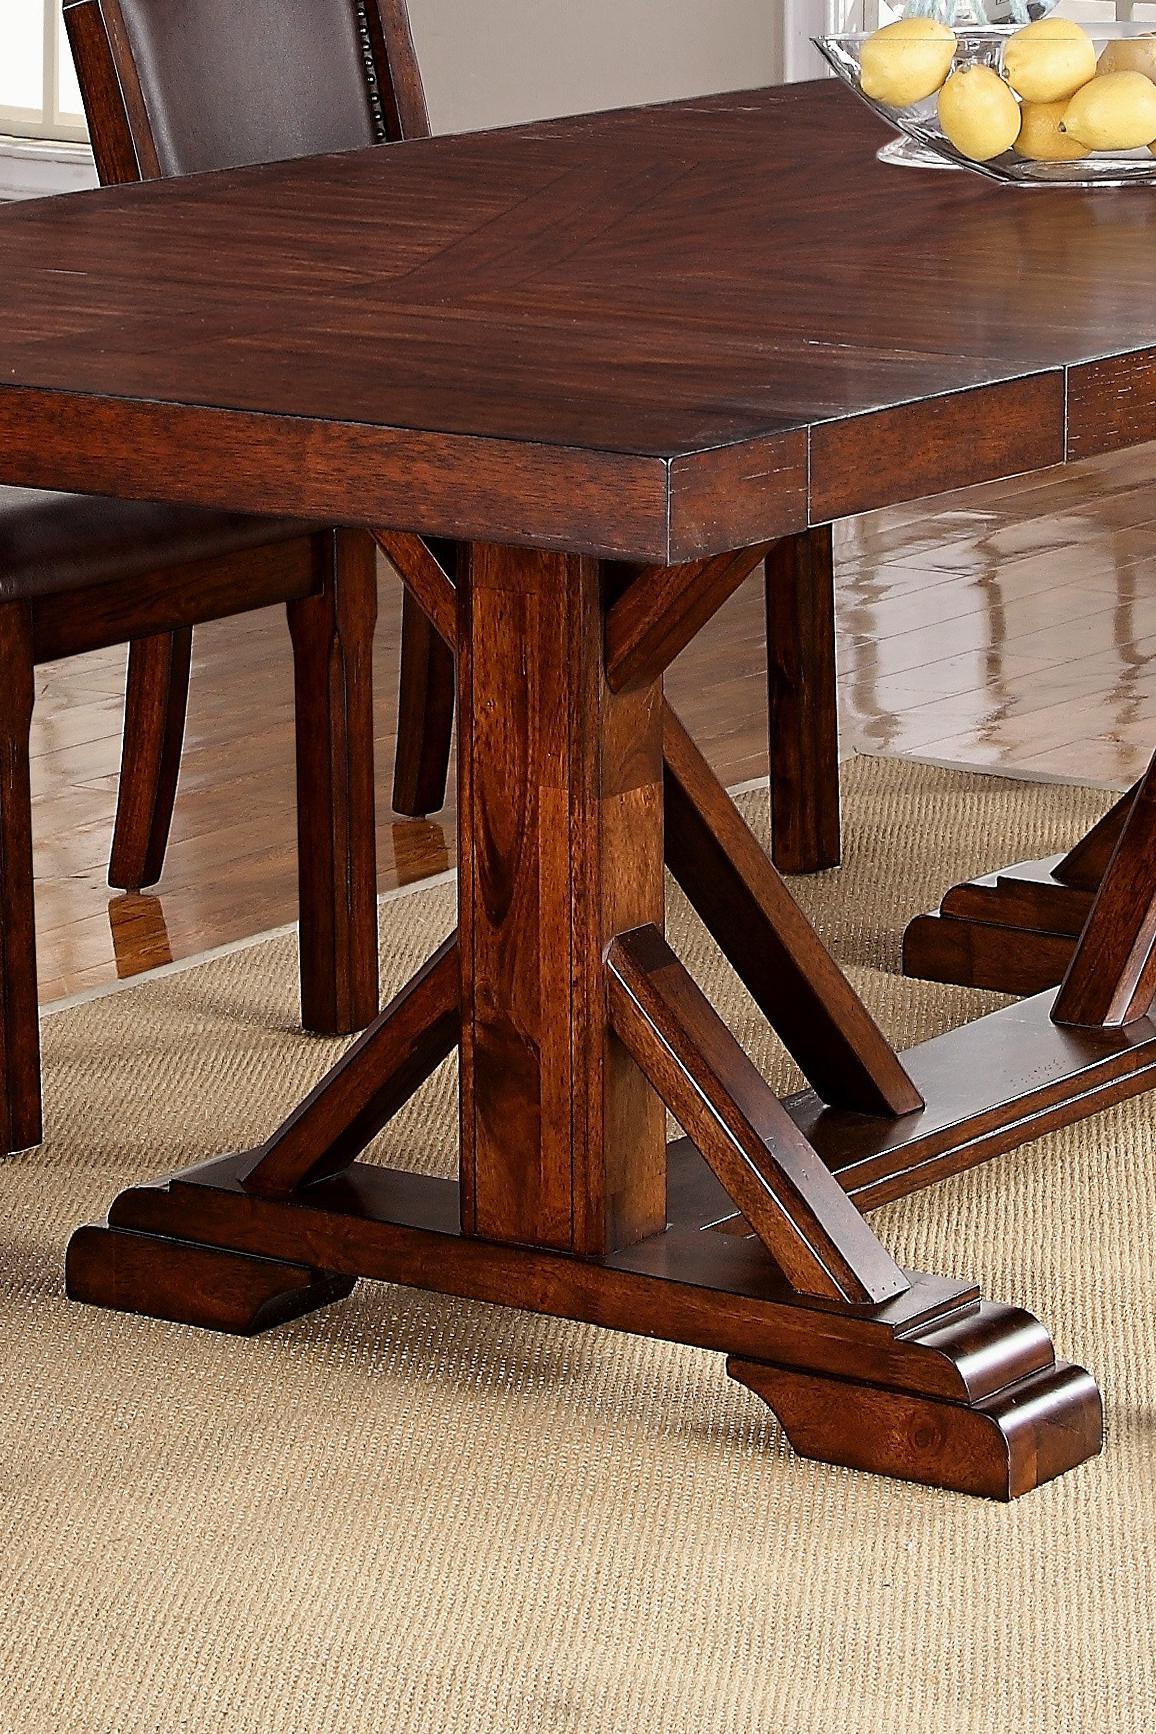 Cascade Trestle Table + 6 Chairs   Walkeru0027s Furniture   Dining 7 (or More)  Piece Set Spokane, Kennewick, Tri Cities, Wenatchee, Coeur Du0027Alene, Yakima,  ...